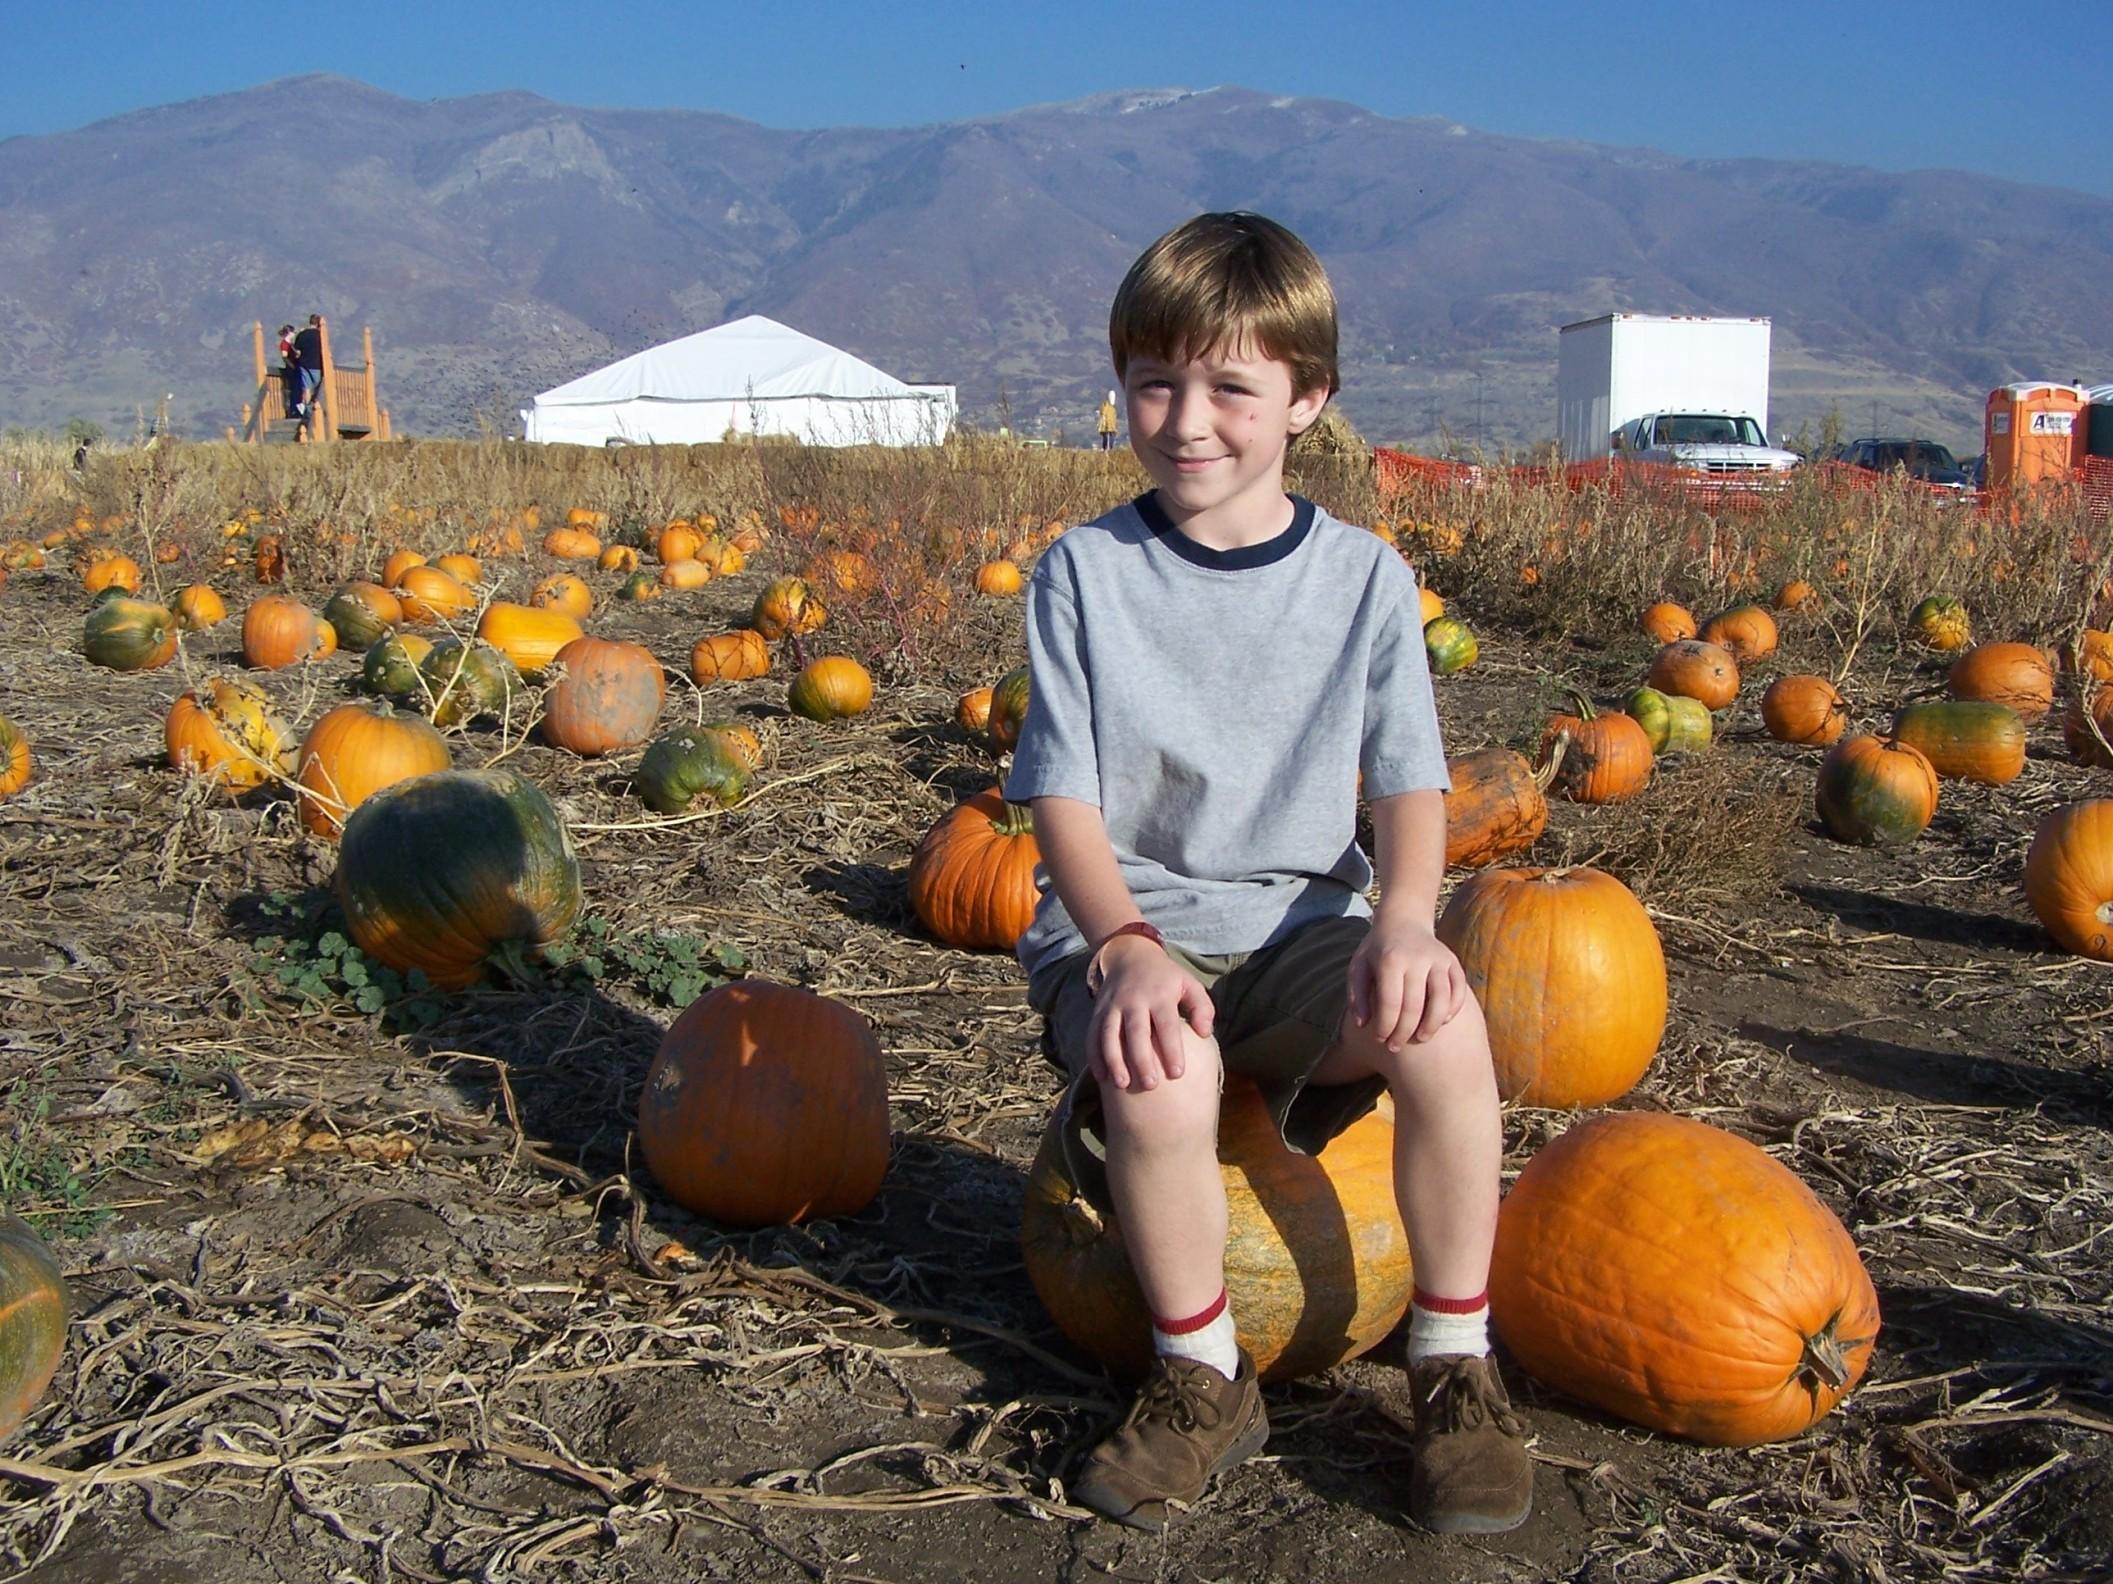 sittin-on-a-pumpkin.jpg